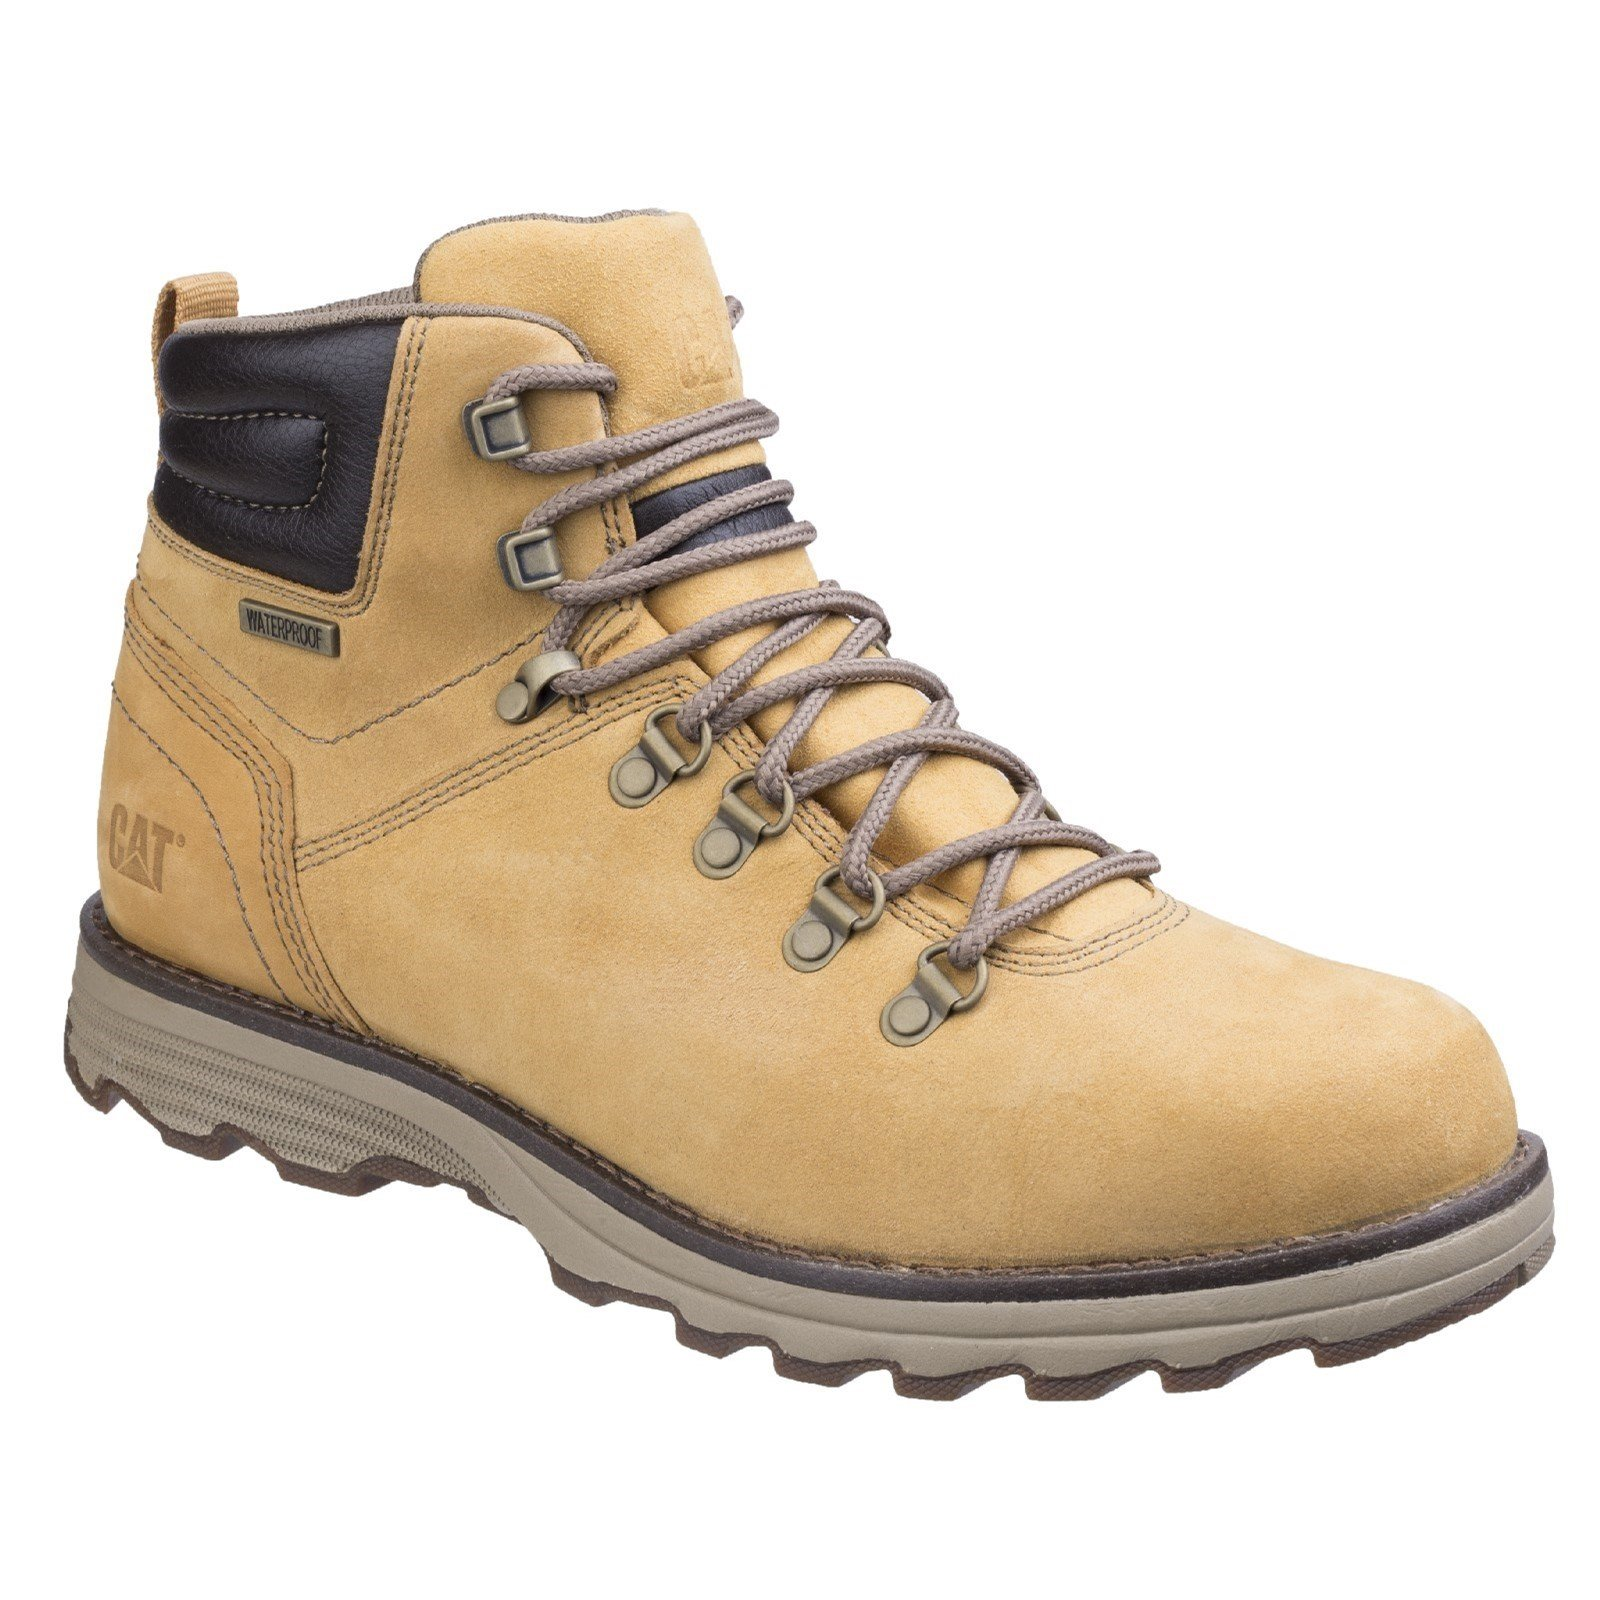 CAT Lifestyle Men's Sire Waterproof Lace Up Boot Honey 26181 - Honey 7